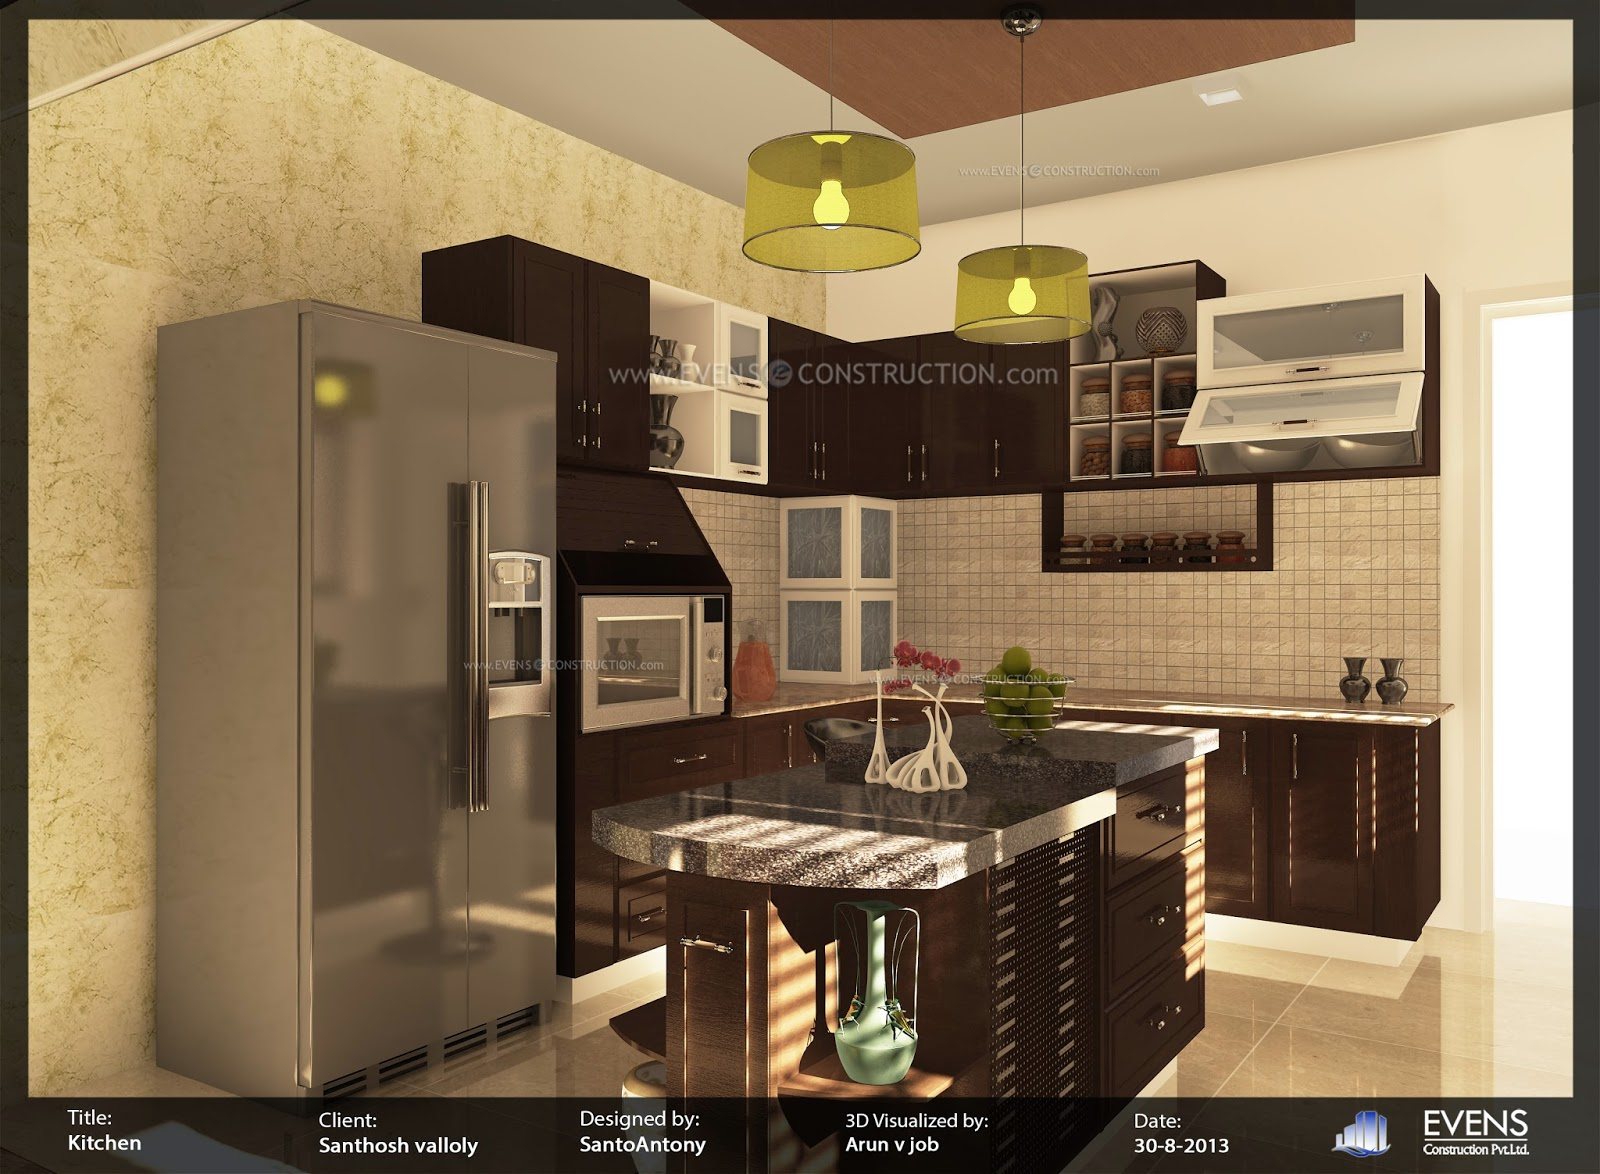 evens construction pvt ltd kerala kitchen interior designs